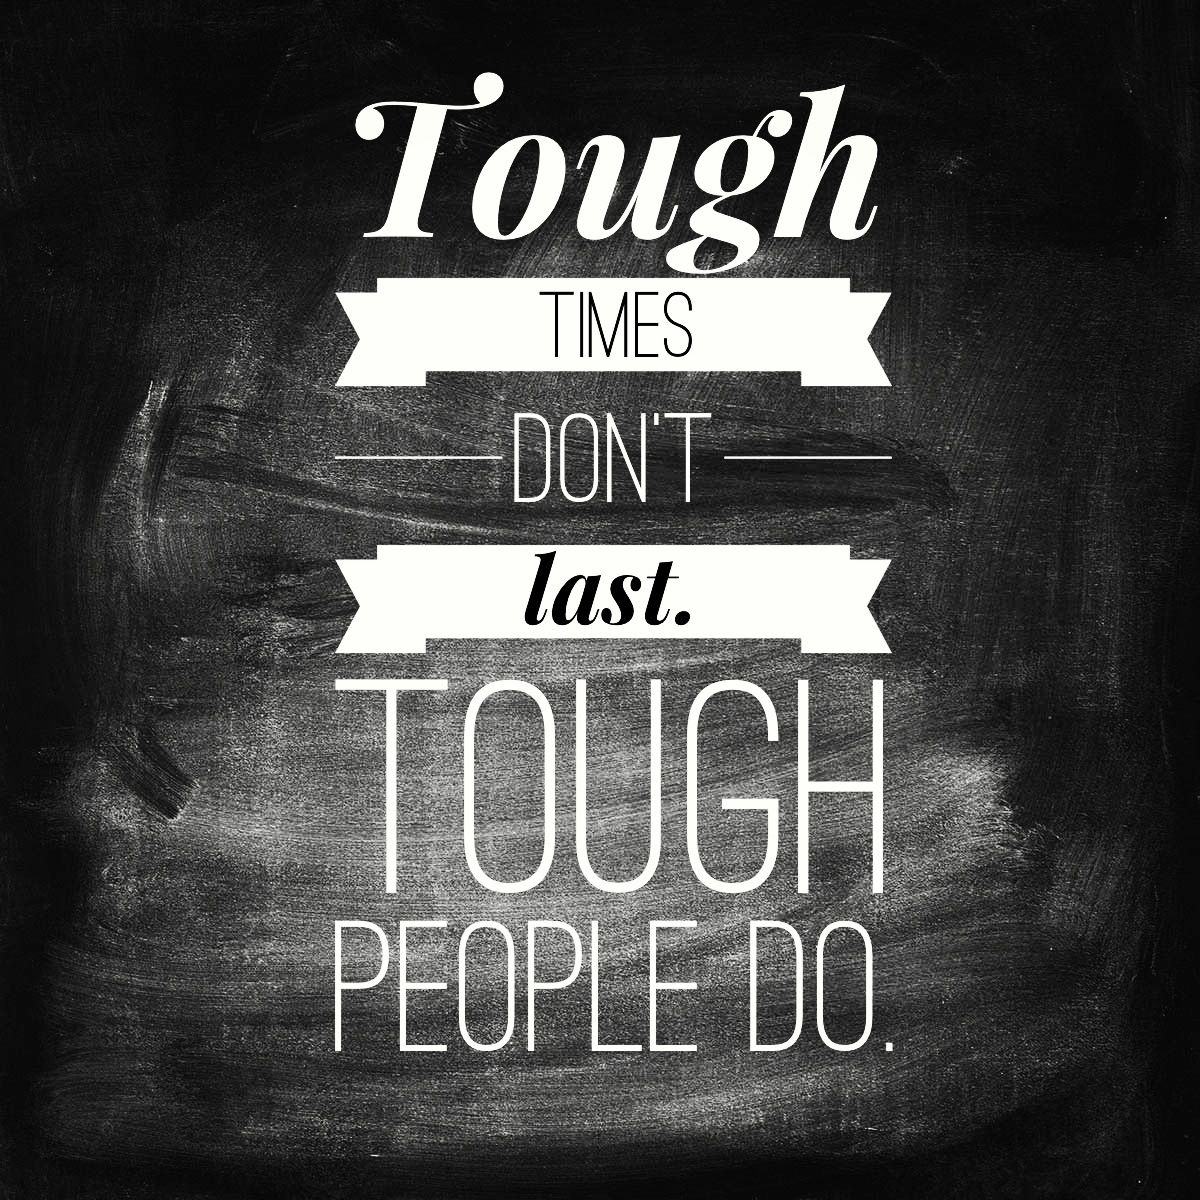 Words That Inspire. Tough Times Don't Last, Tough People